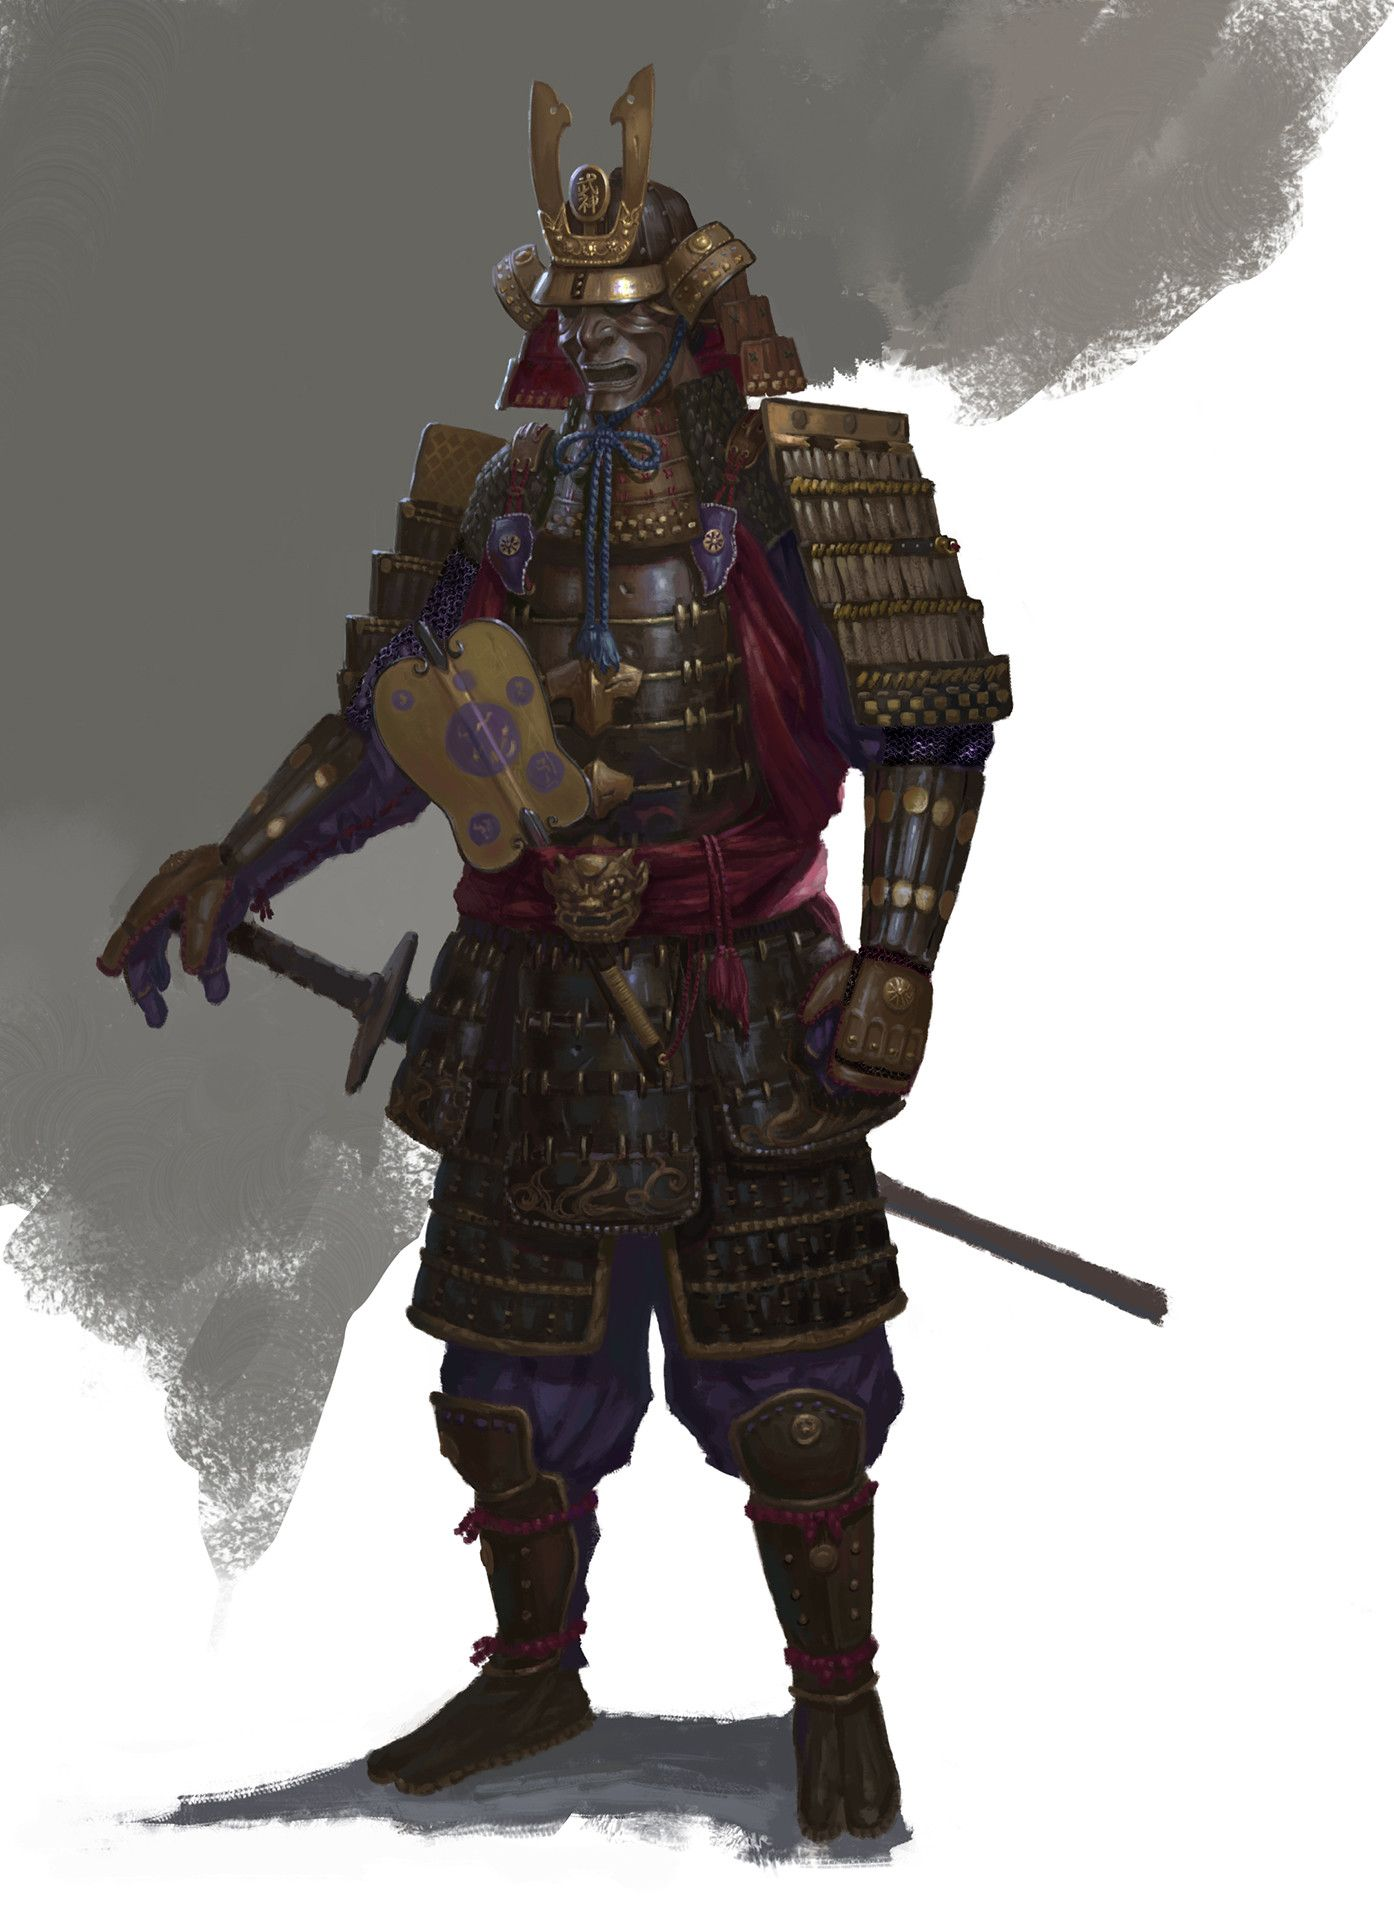 ArtStation - Design, xx r   Historical & Fantasy   Samurai ...  ArtStation - De...